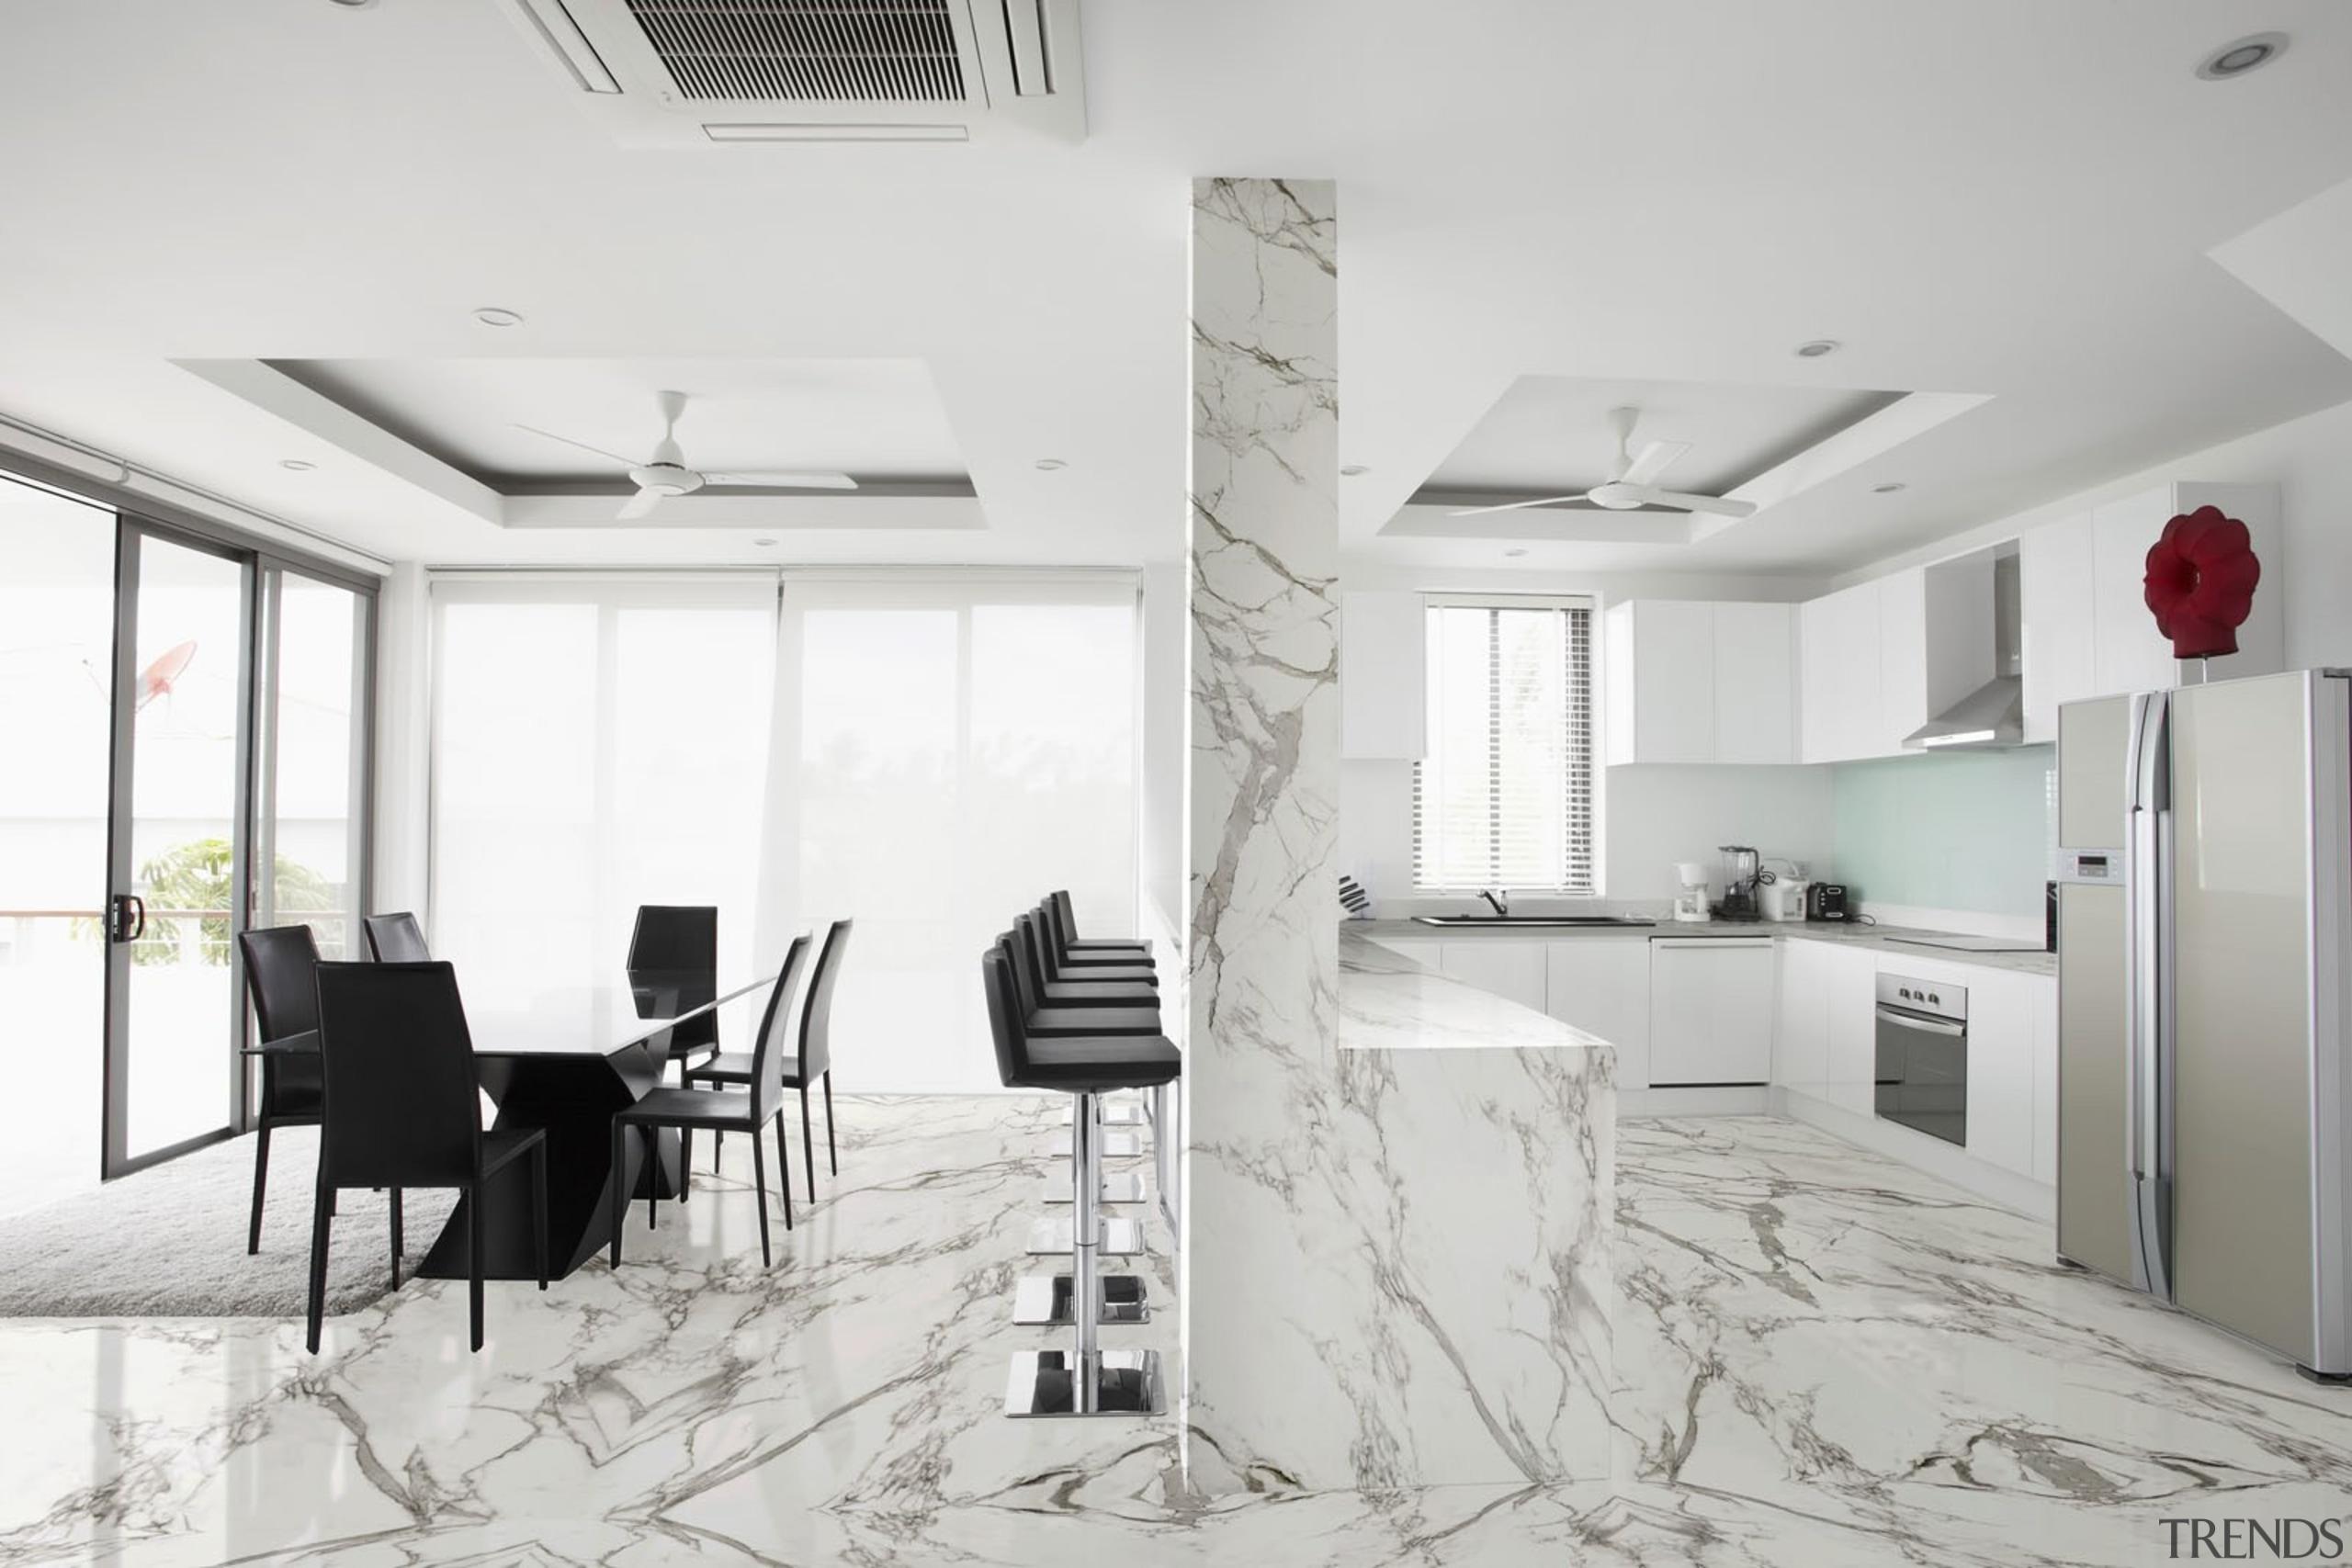 AURA Book Match 1 - AURA Book Match floor, interior design, product design, gray, white